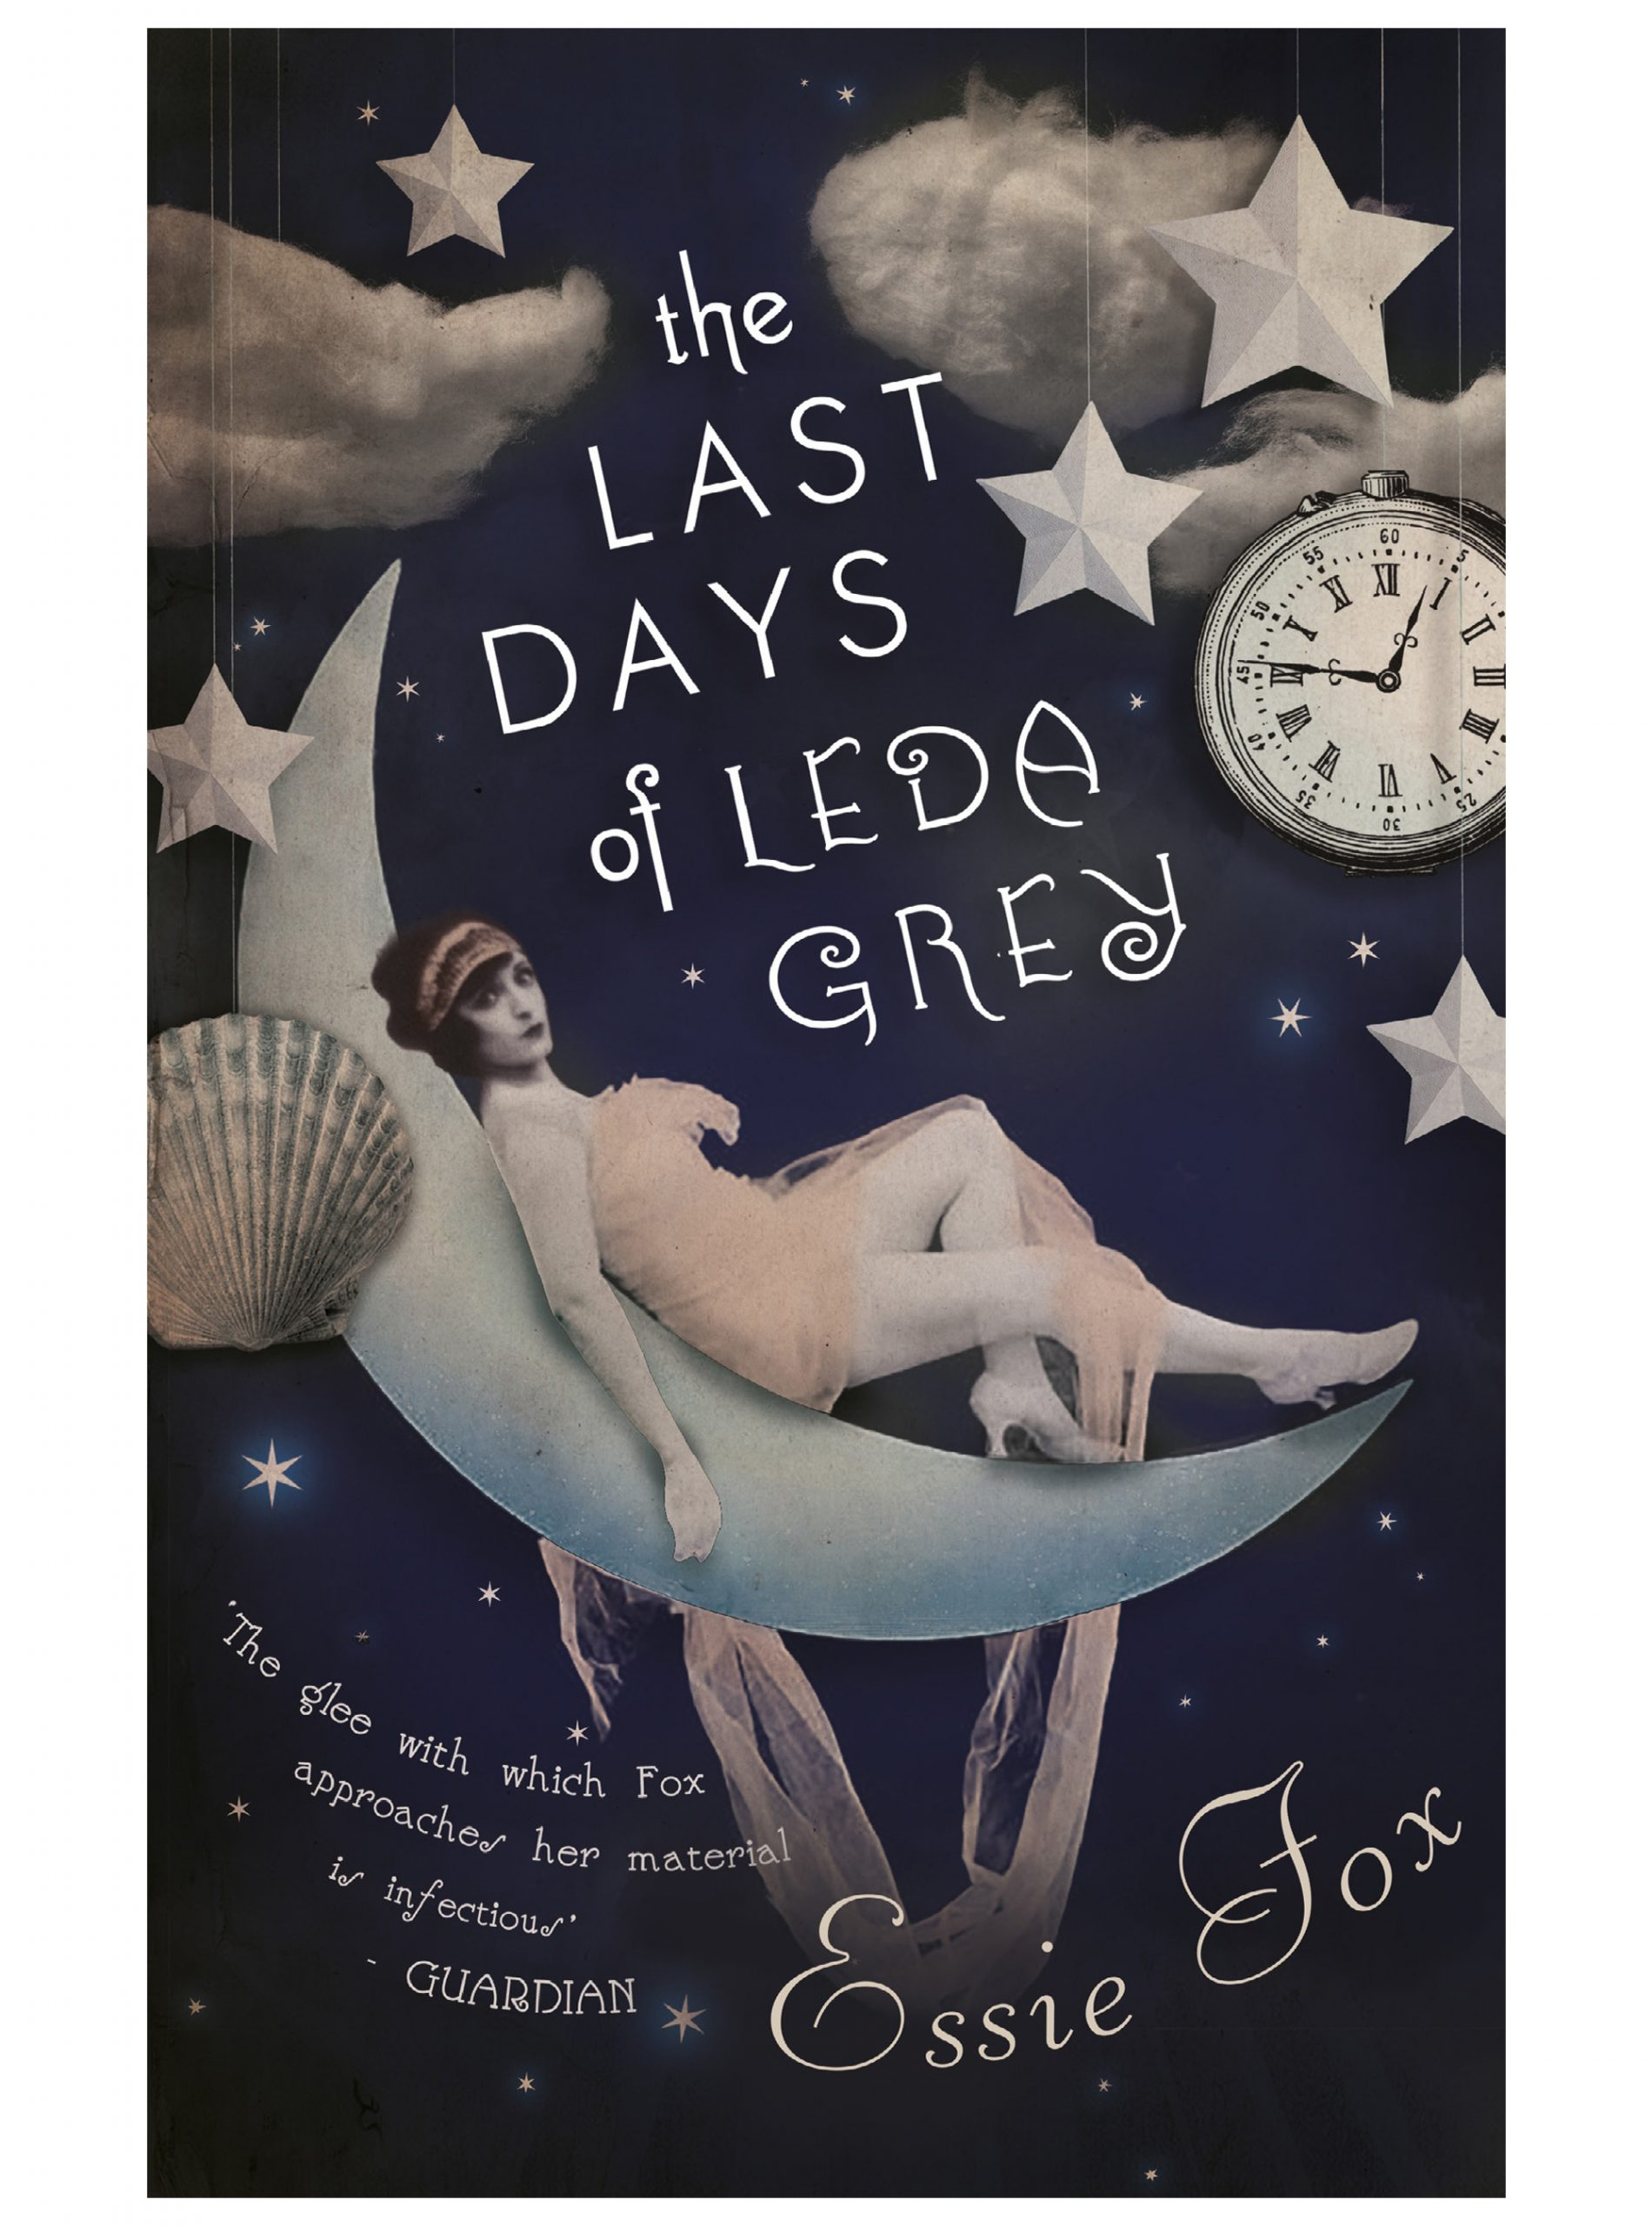 Last Days of Leda Grey